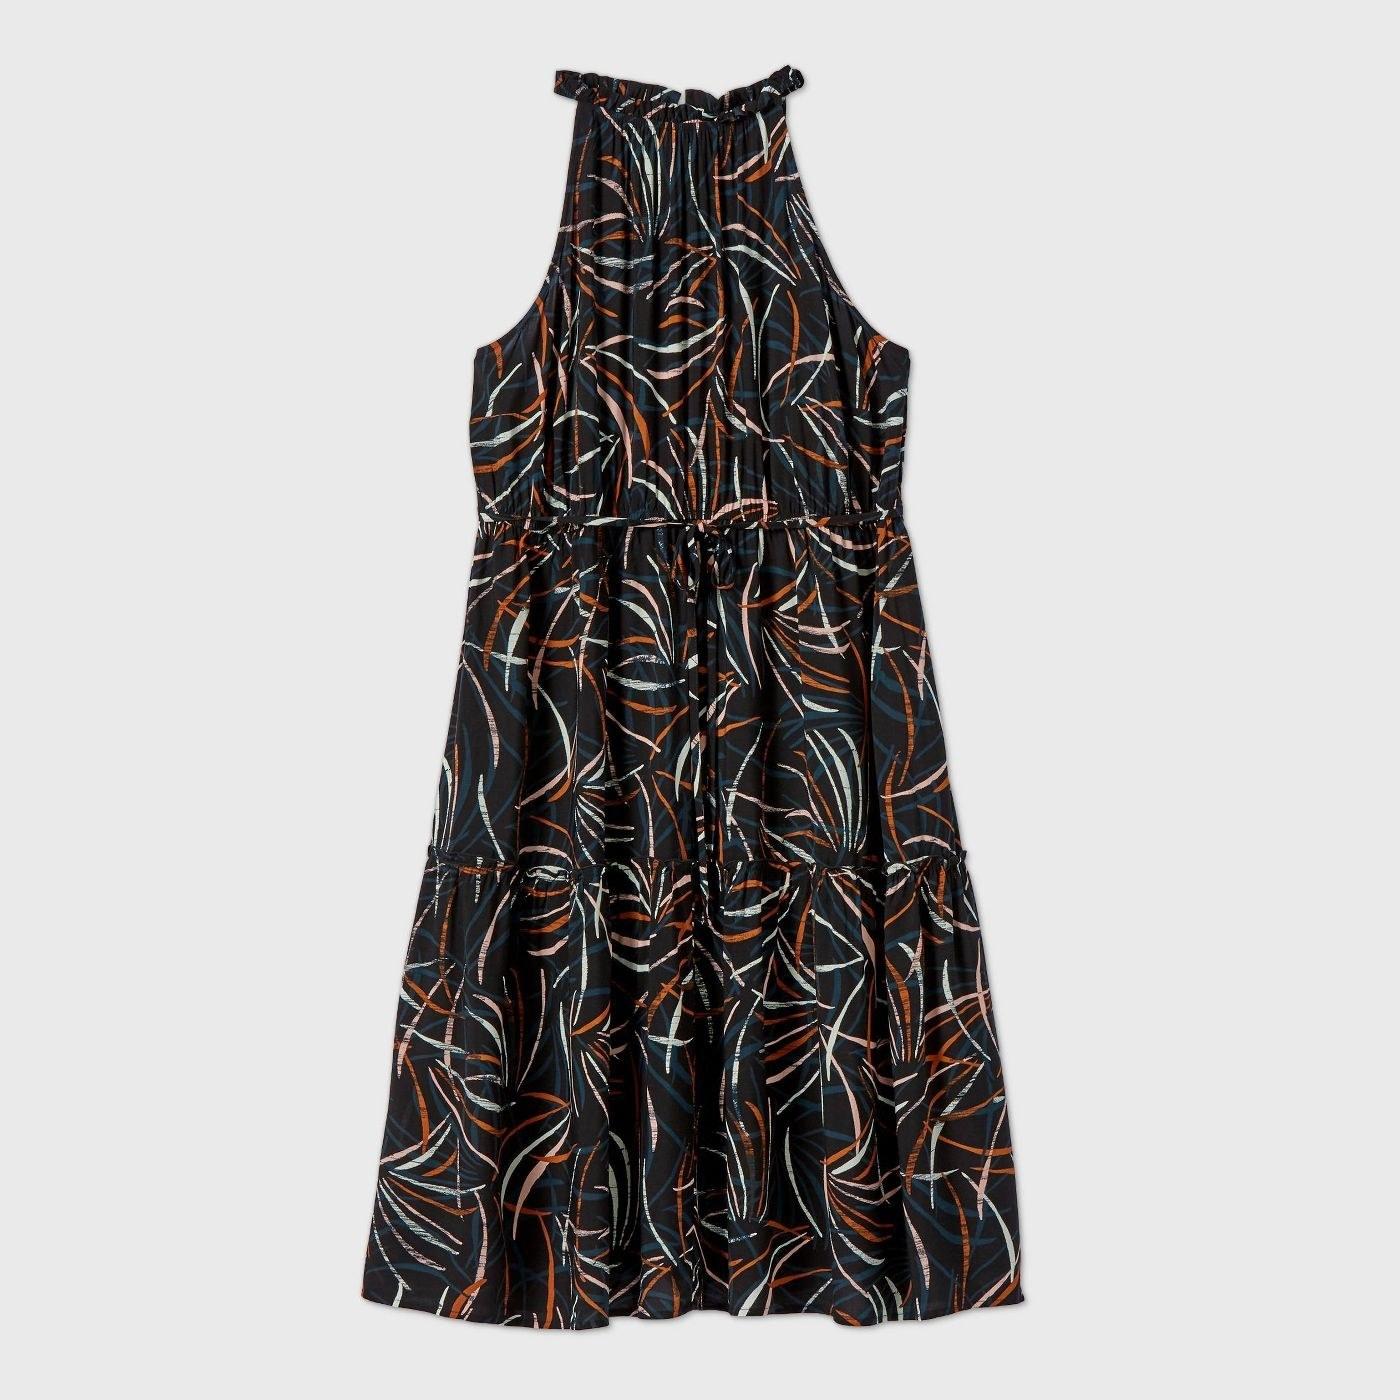 the black high neck dress